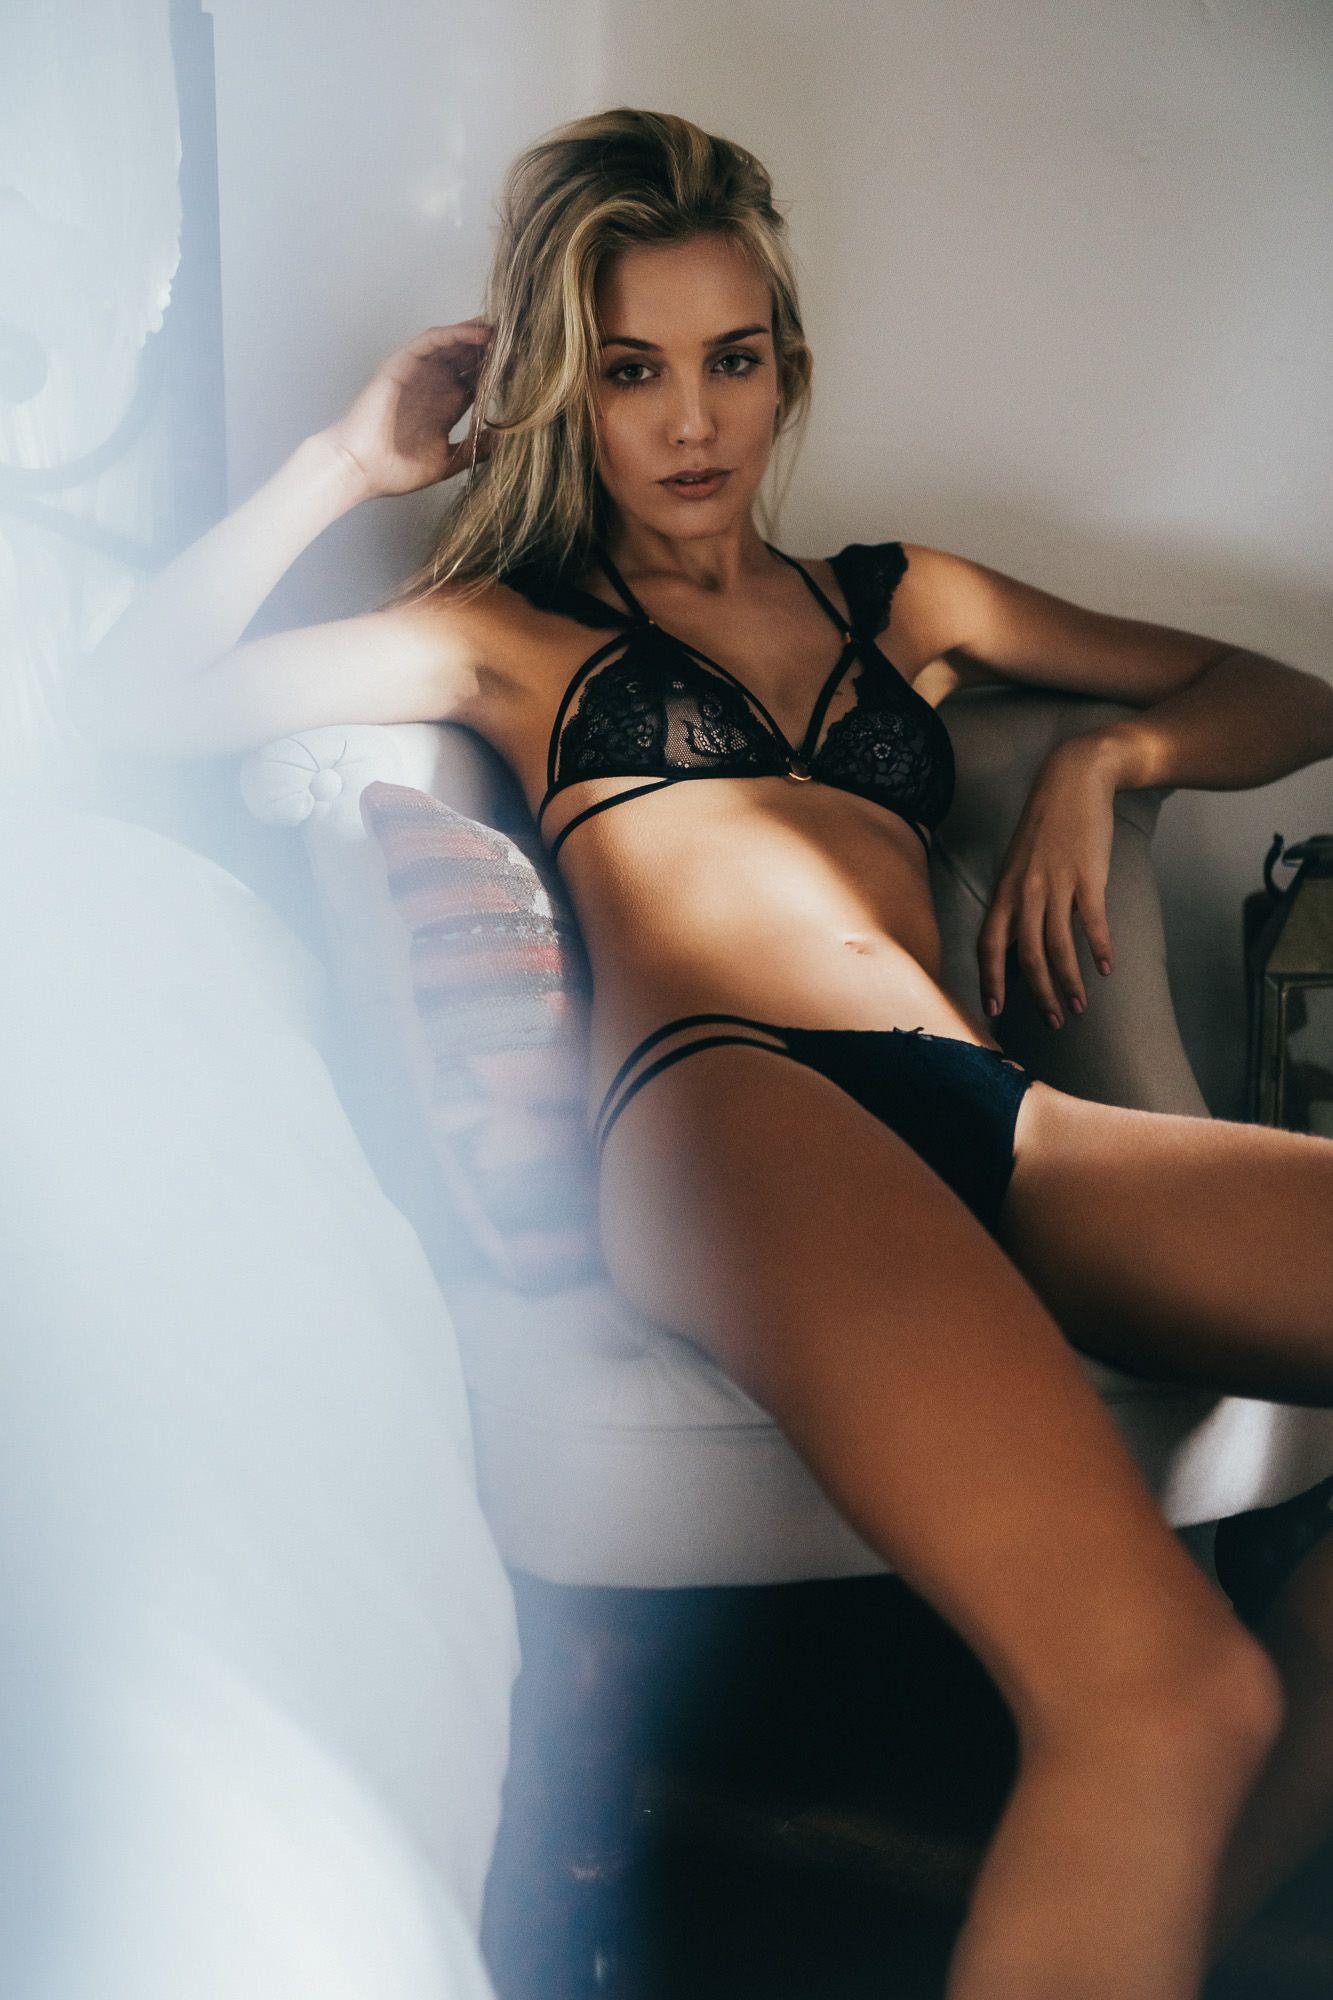 Natalya Nude Simple Ознакомьтесь с этим проектом @behance: «natalya» https://www